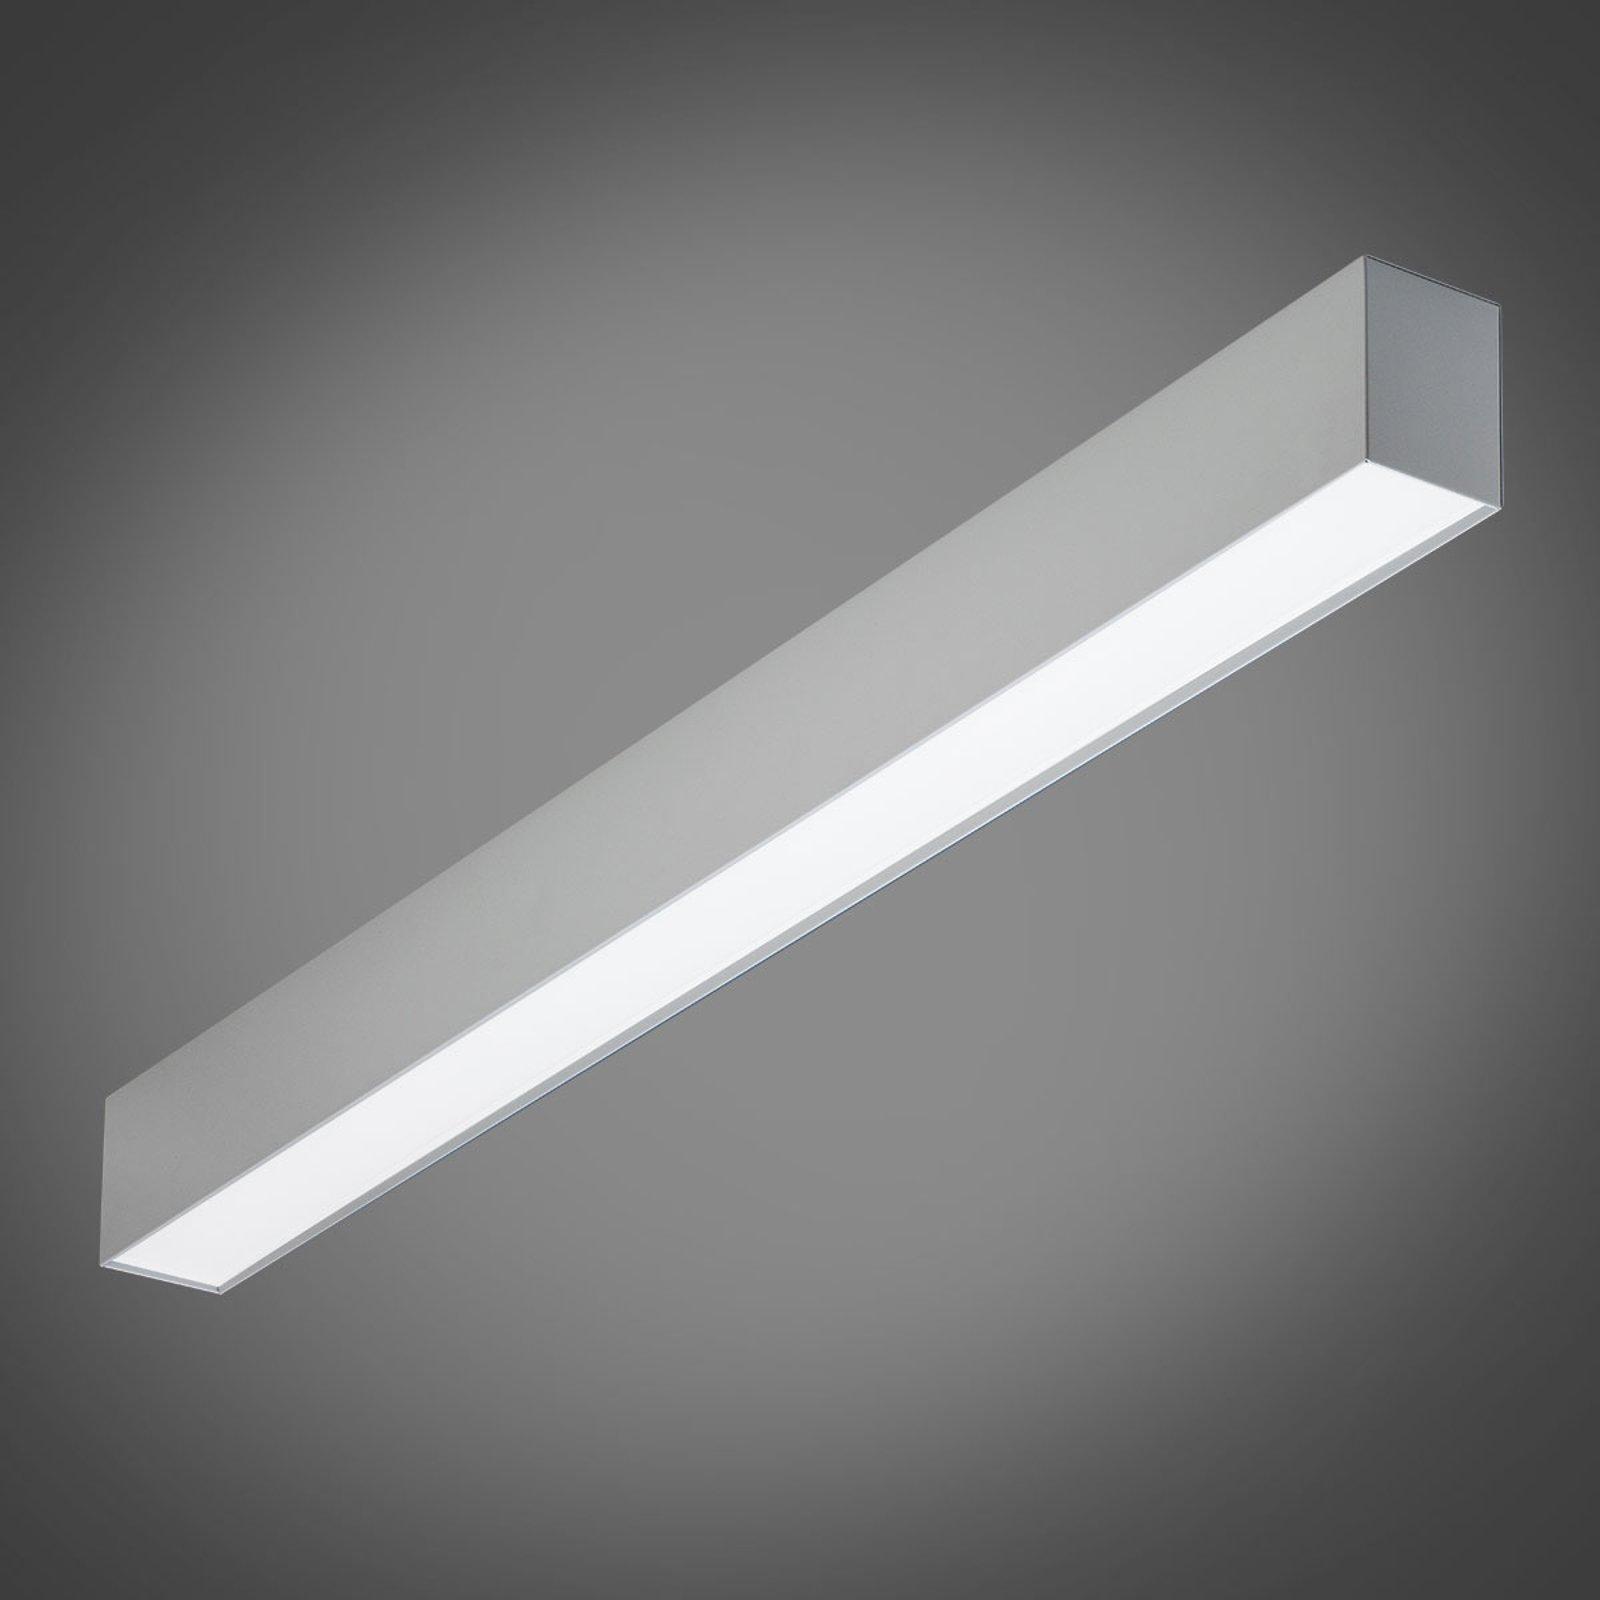 Energieffektiv LED-vegglampe LIPW075, 4 000K